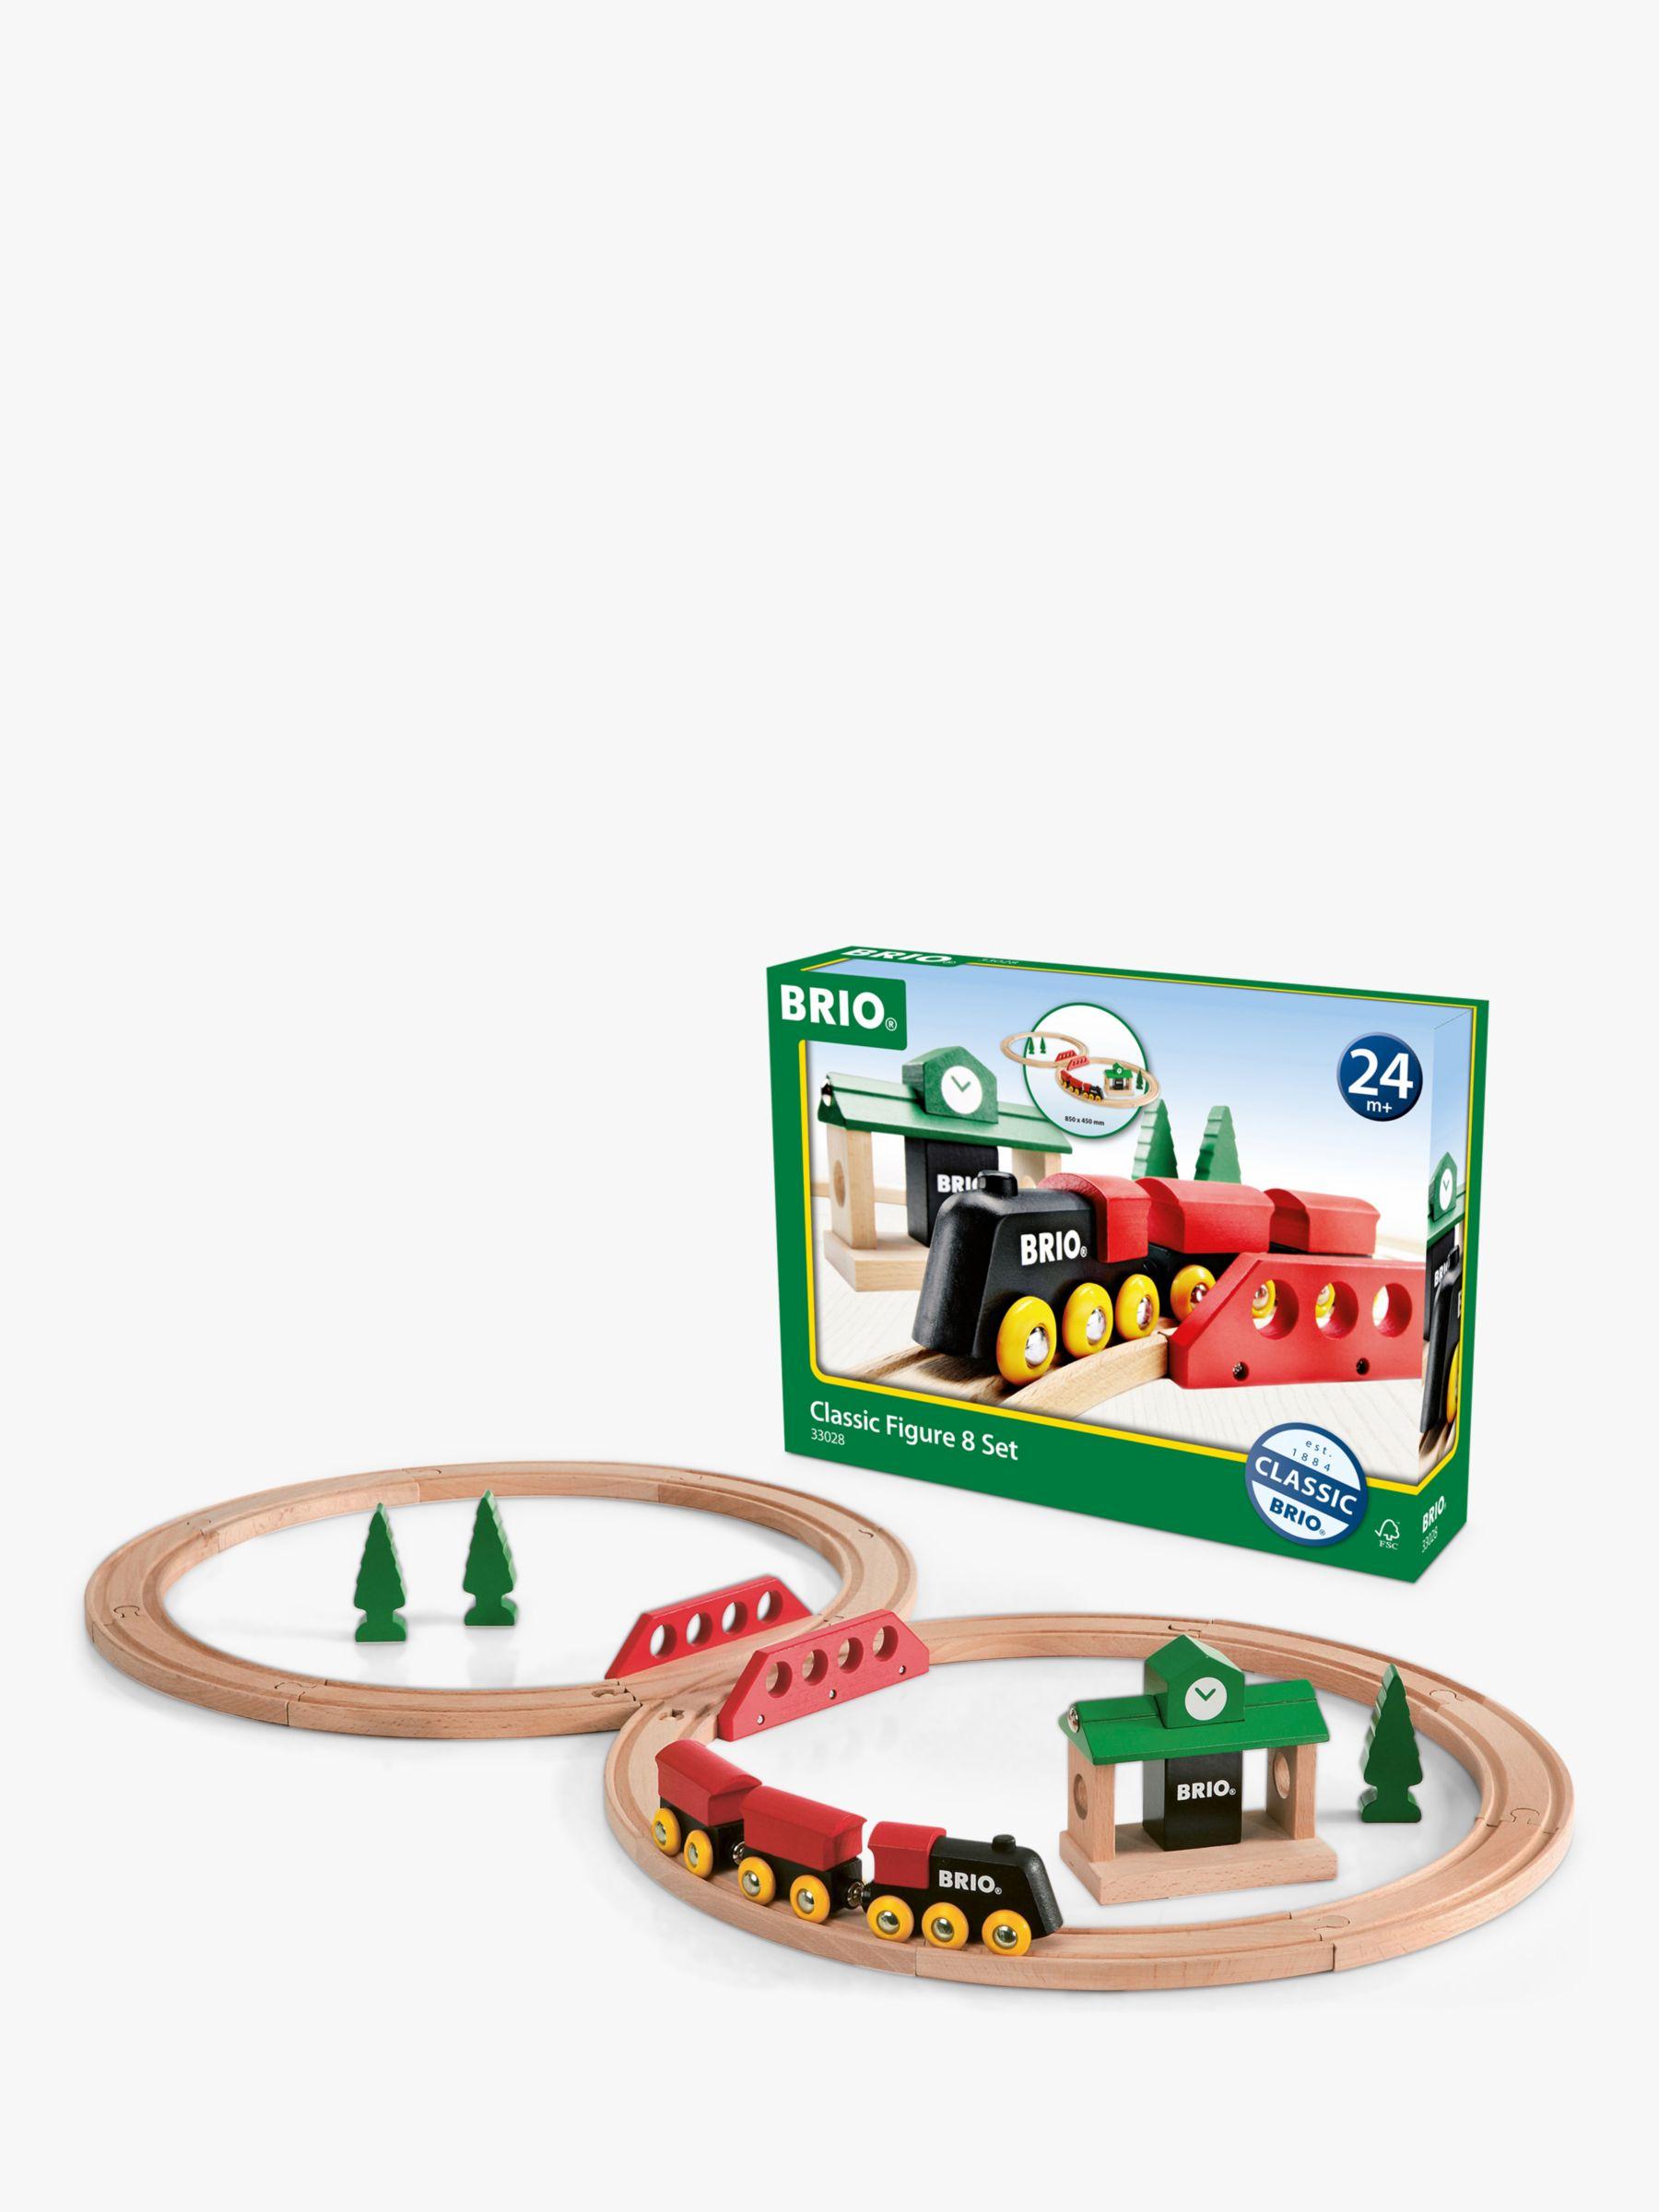 BRIO BRIO Classic Railway Figure 8 Train Set